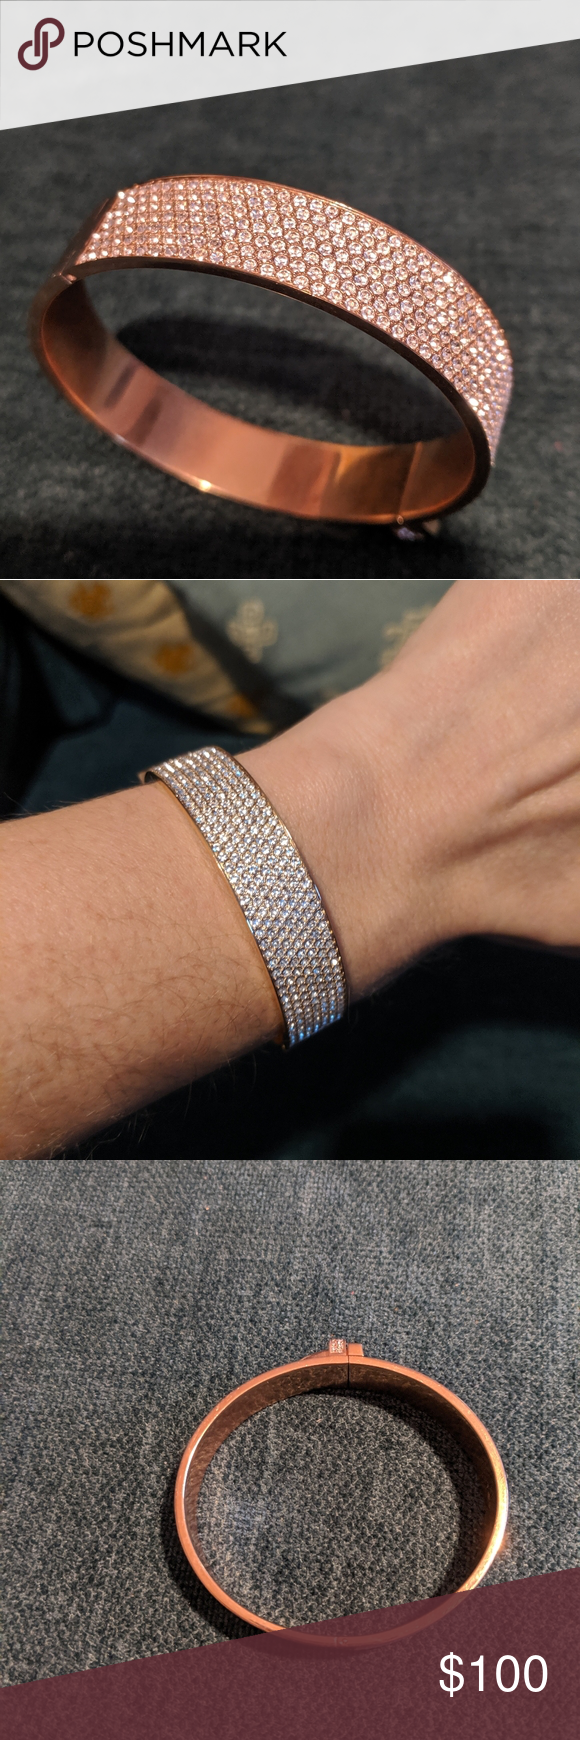 35++ Jewelry swarovski crystal bangle bracelets information